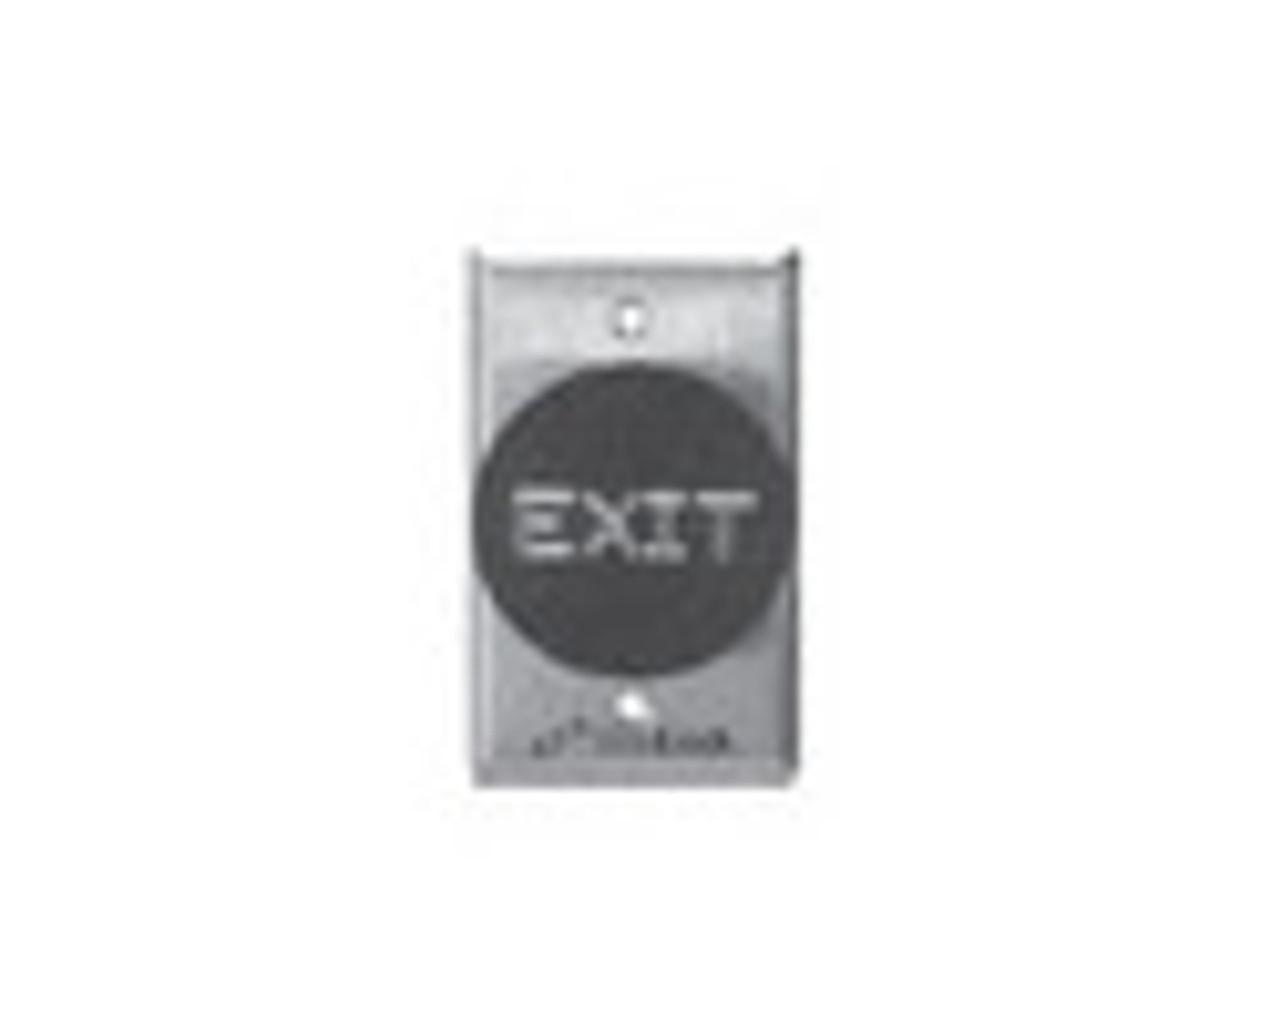 2280-US10 DynaLock 2280 Series Single SlimLine Electromagnetic Lock for Outswing Door in Satin Bronze